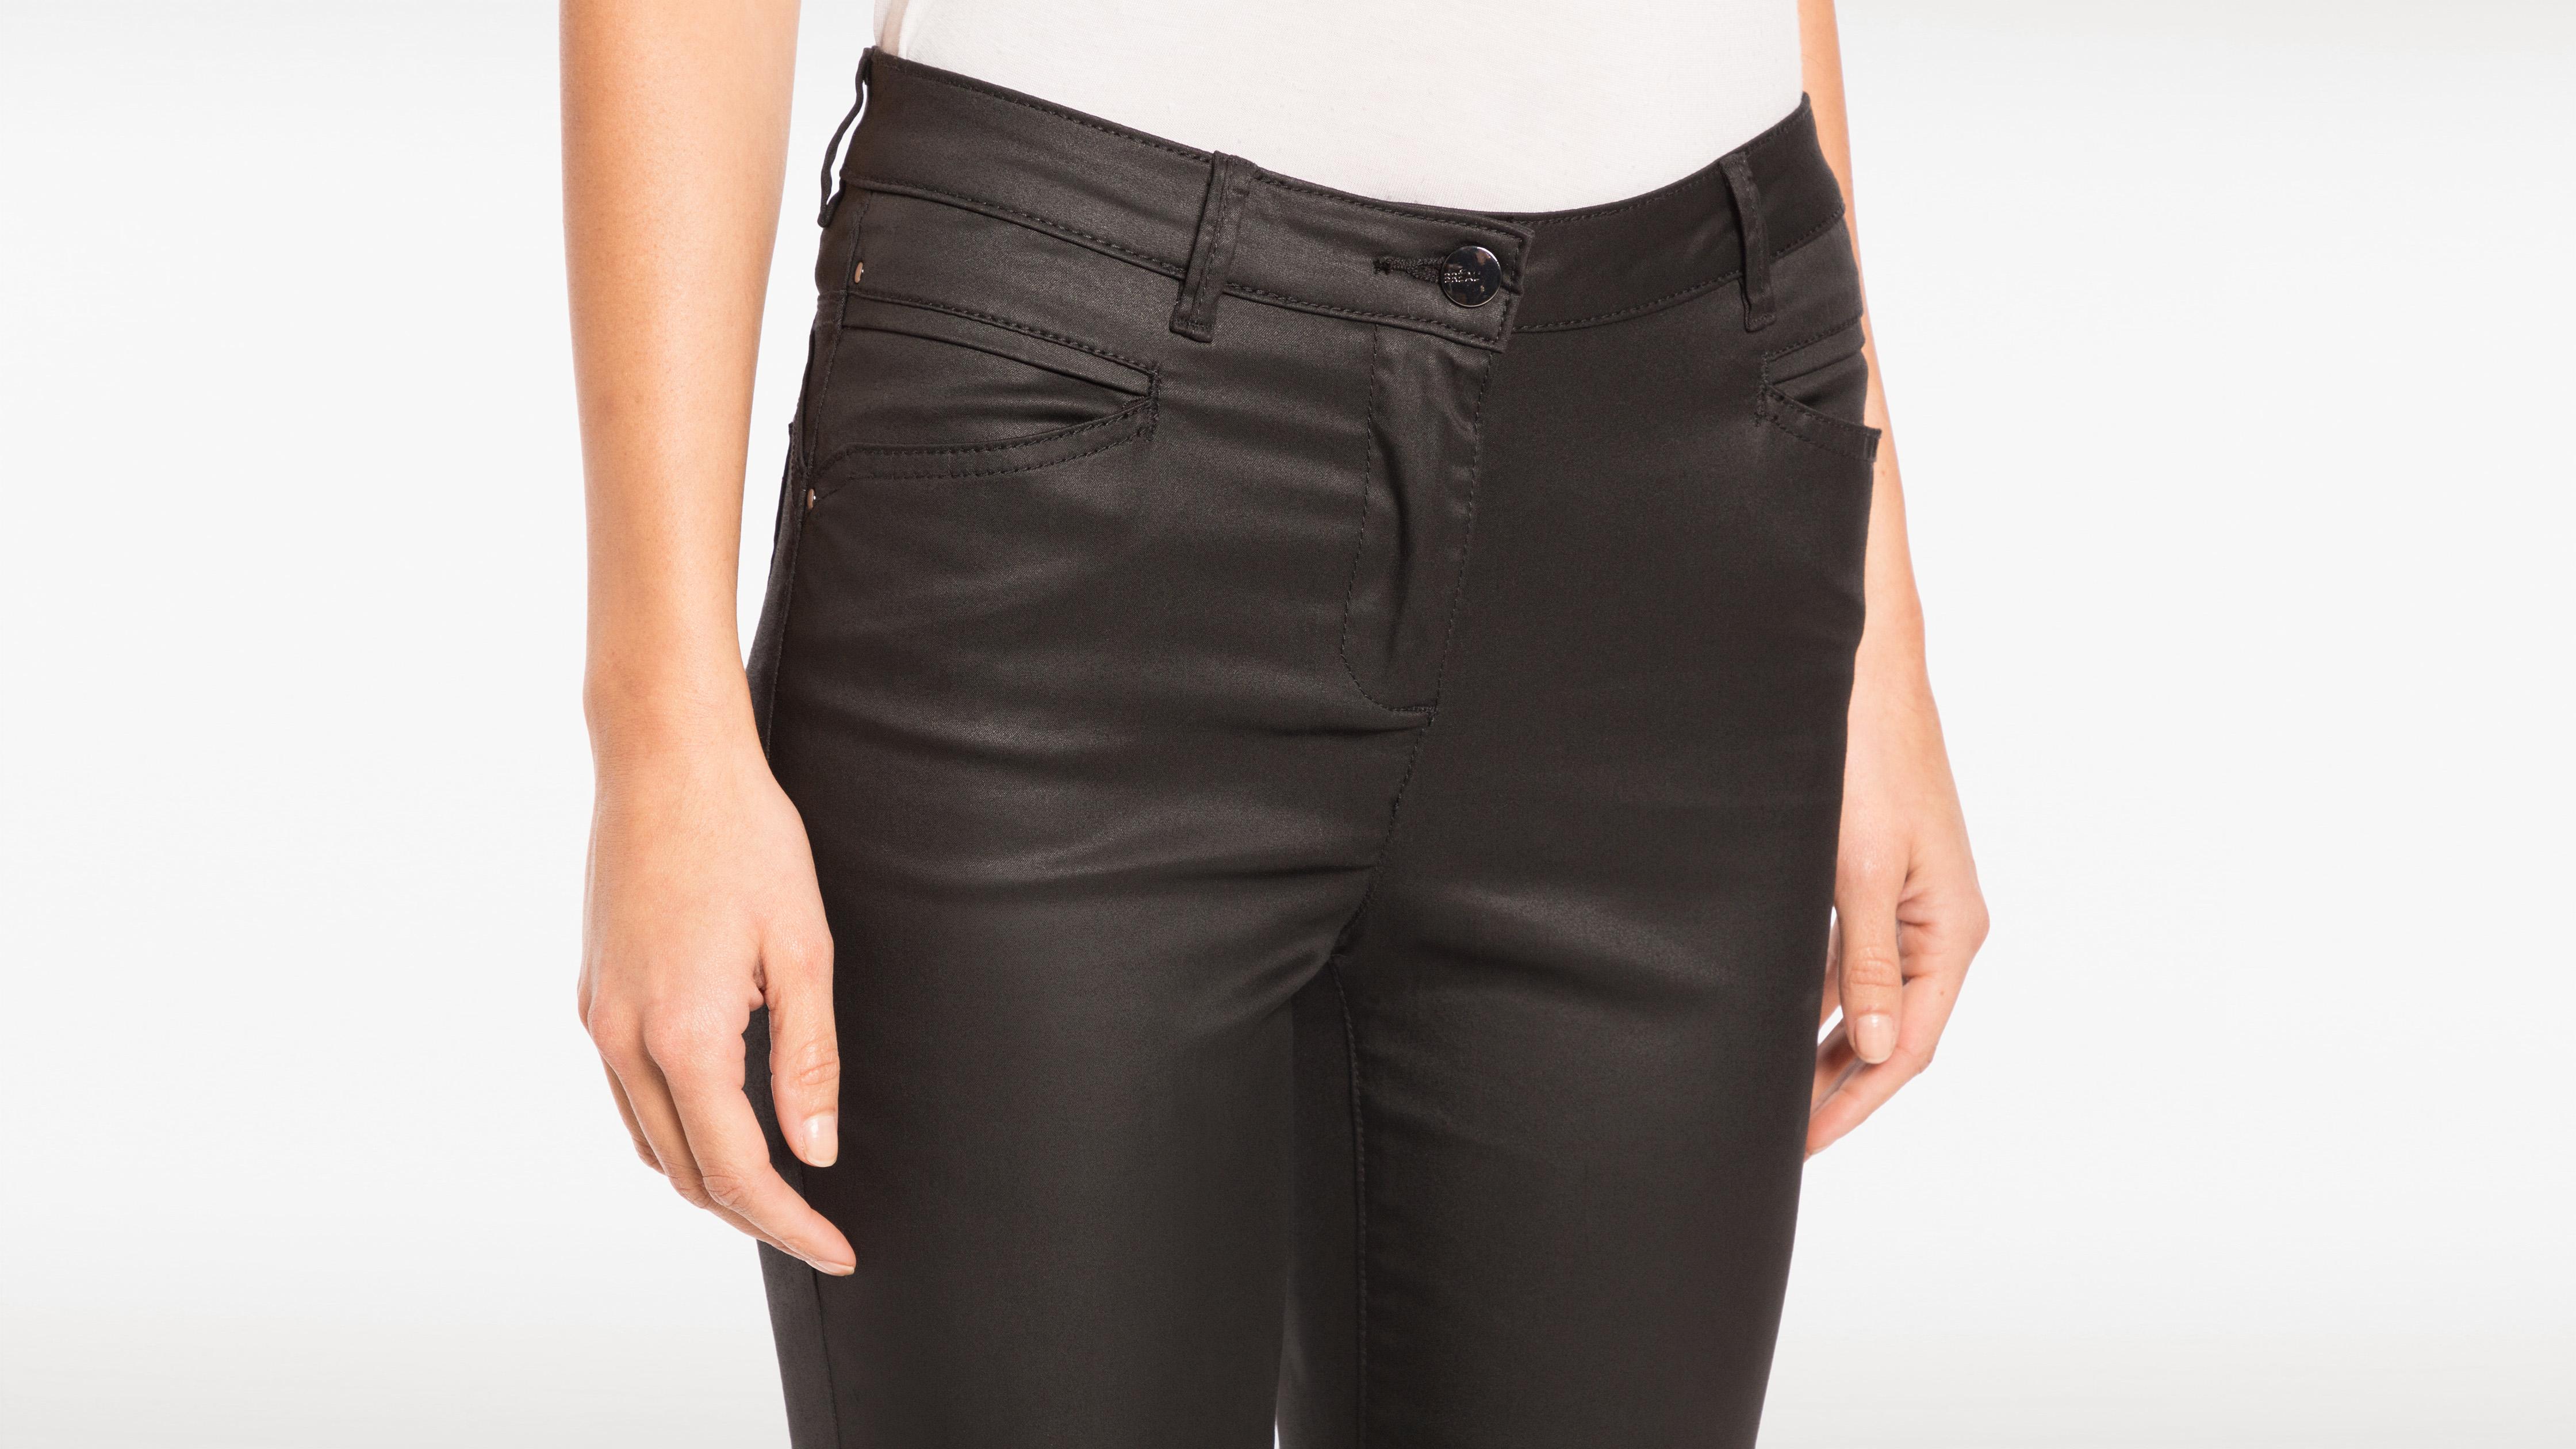 Enduit Pantalon Noir 78ème Femme ybvYf67g